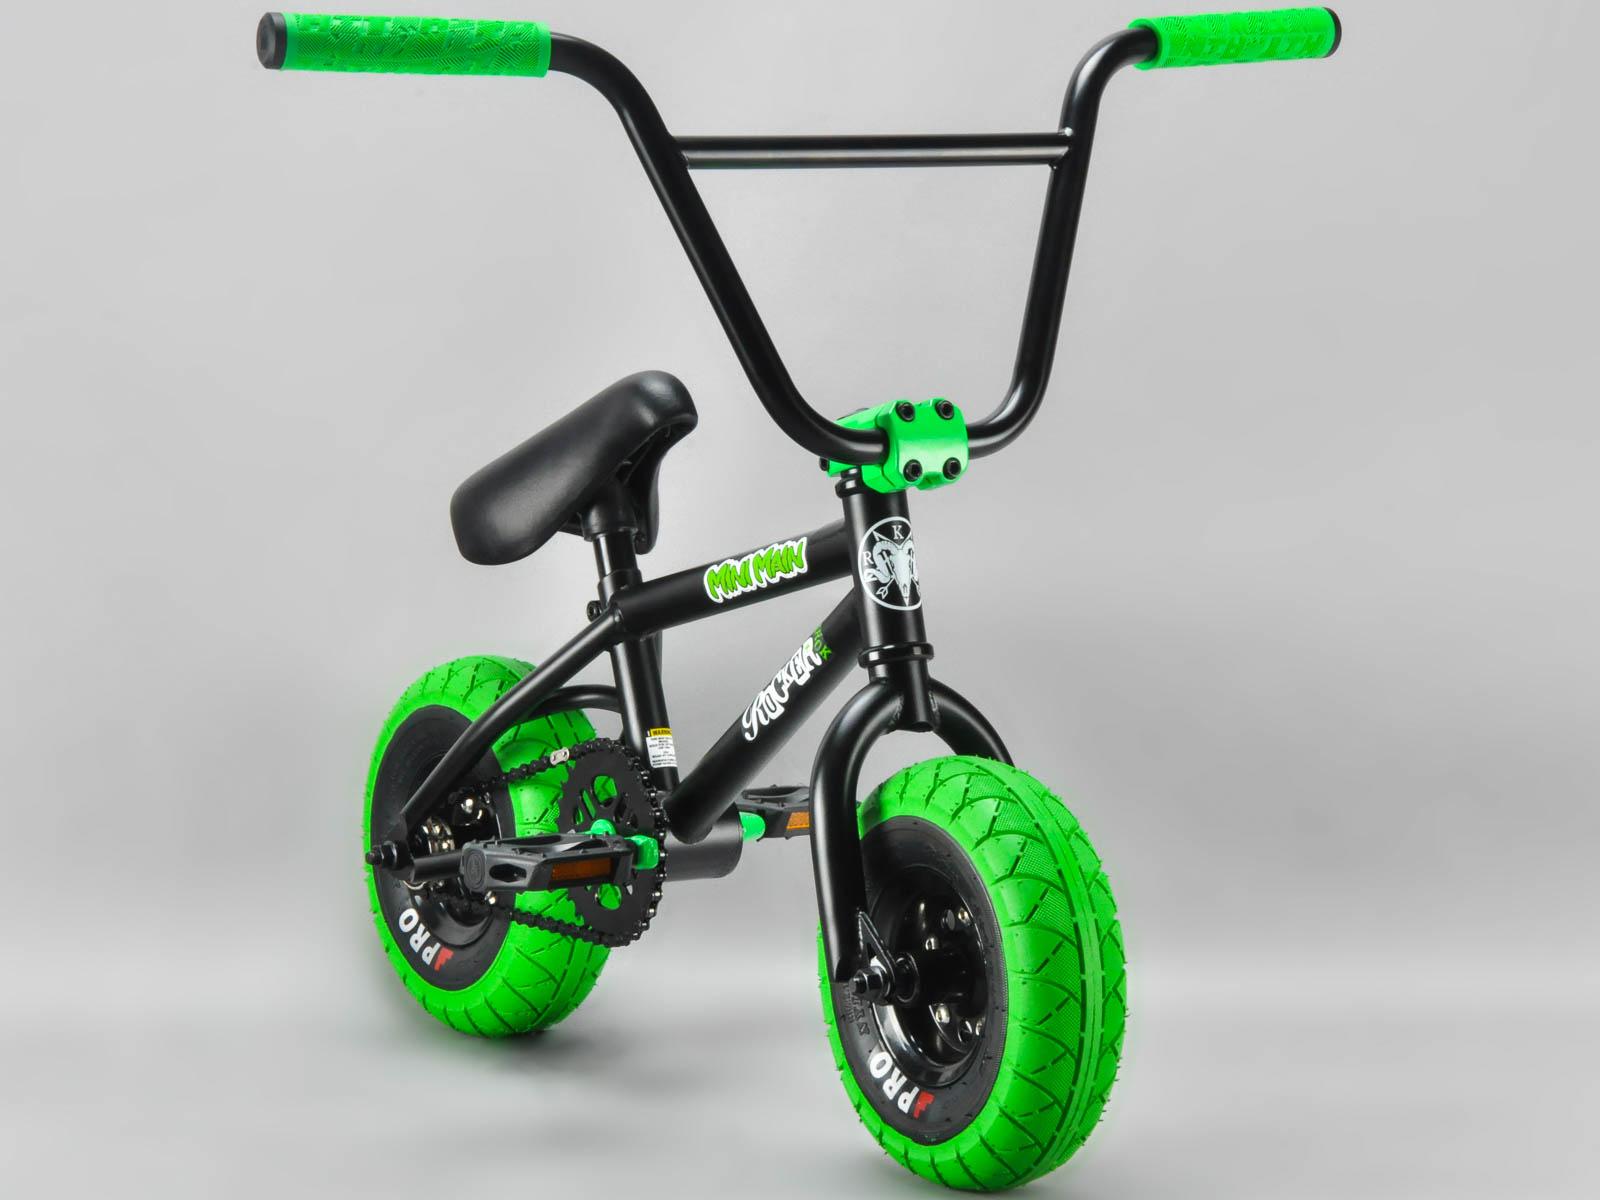 genuine rocker mini main irok bmx rkr mini bmx bike. Black Bedroom Furniture Sets. Home Design Ideas